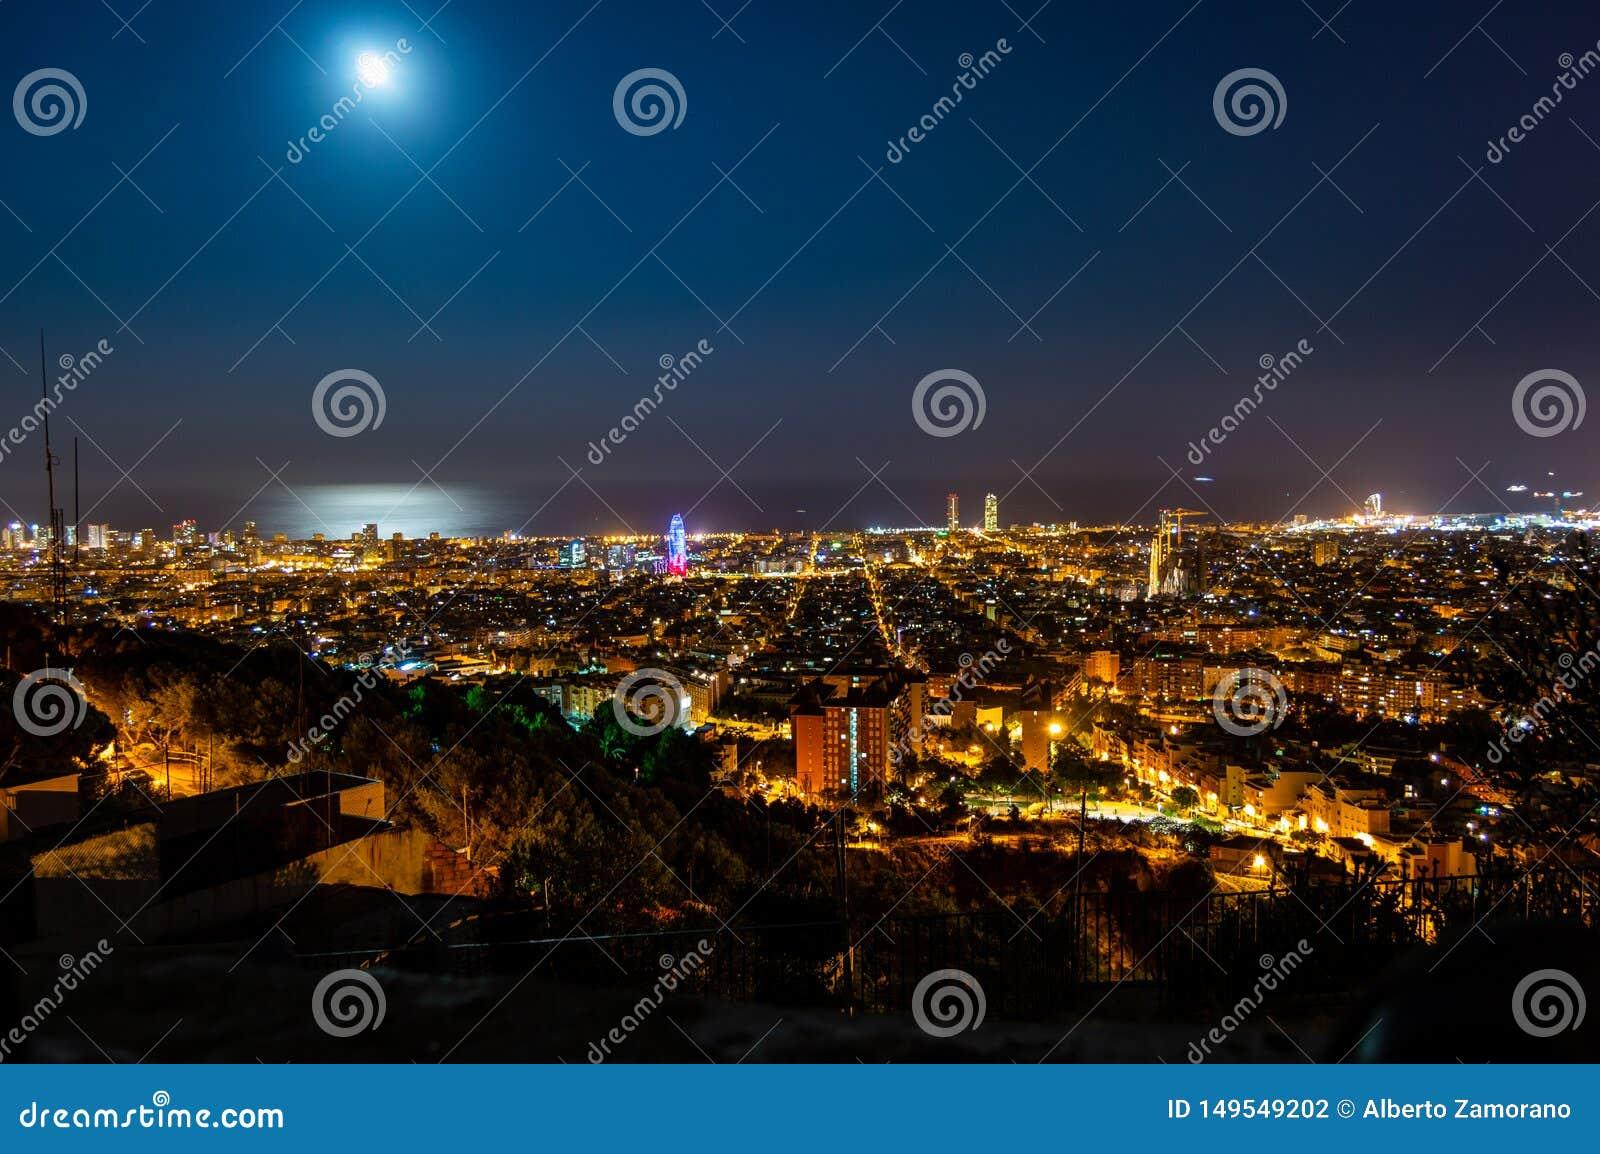 De horizonpanorama van Barcelona bij nacht van Turo Rovira, Cataloni?, Spanje